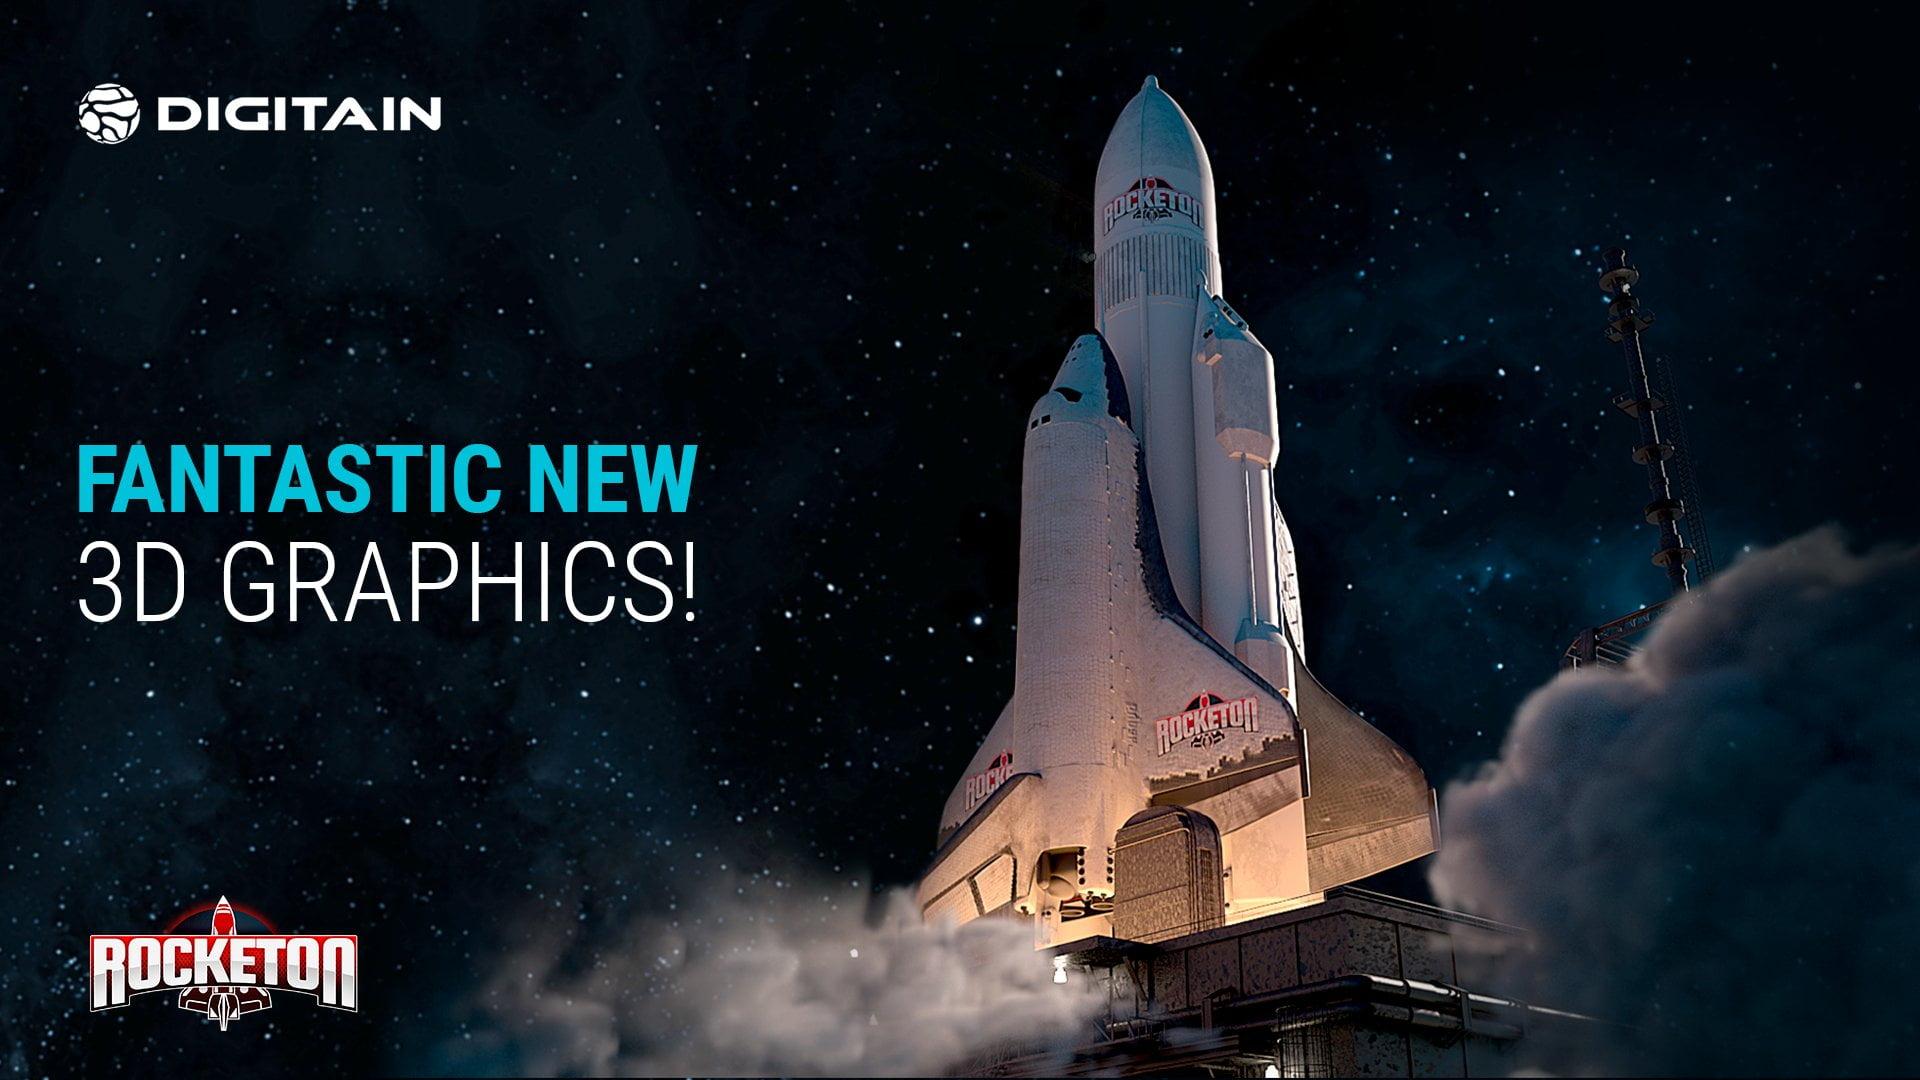 Digitain Announce Rocketon! Launch